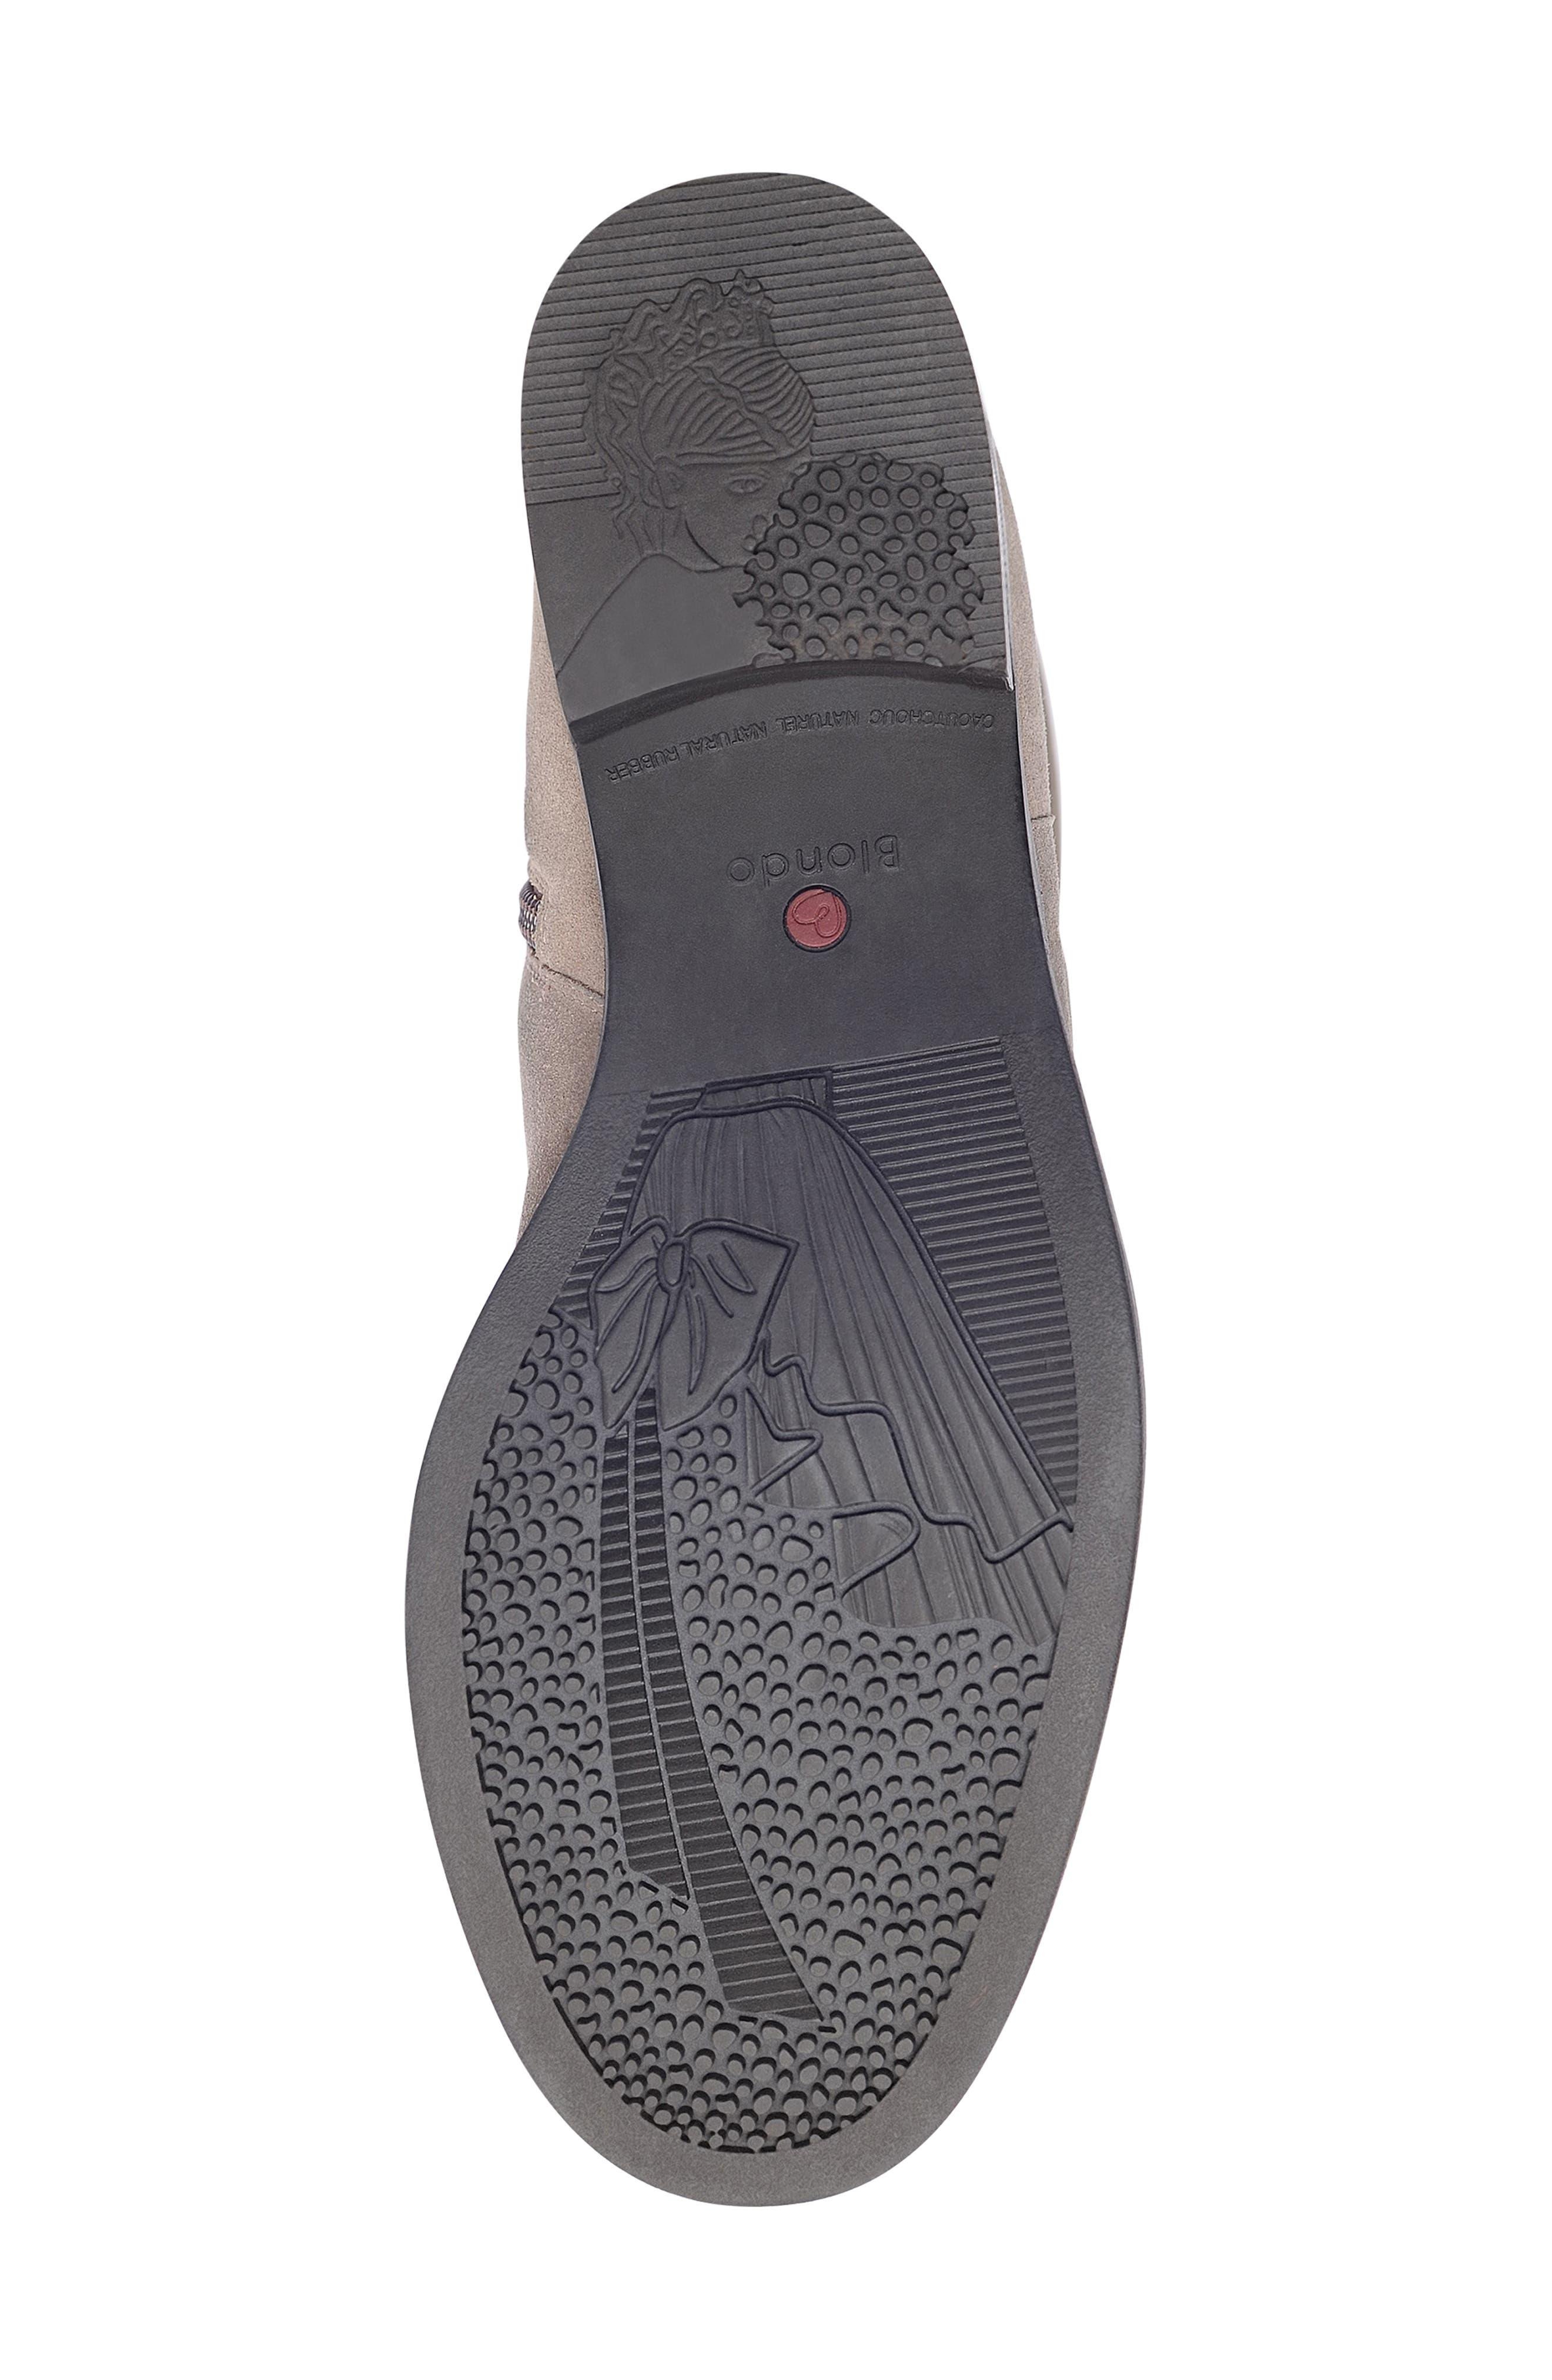 BLONDO, Erika Waterproof Knee High Boot, Alternate thumbnail 6, color, DARK TAUPE SUEDE